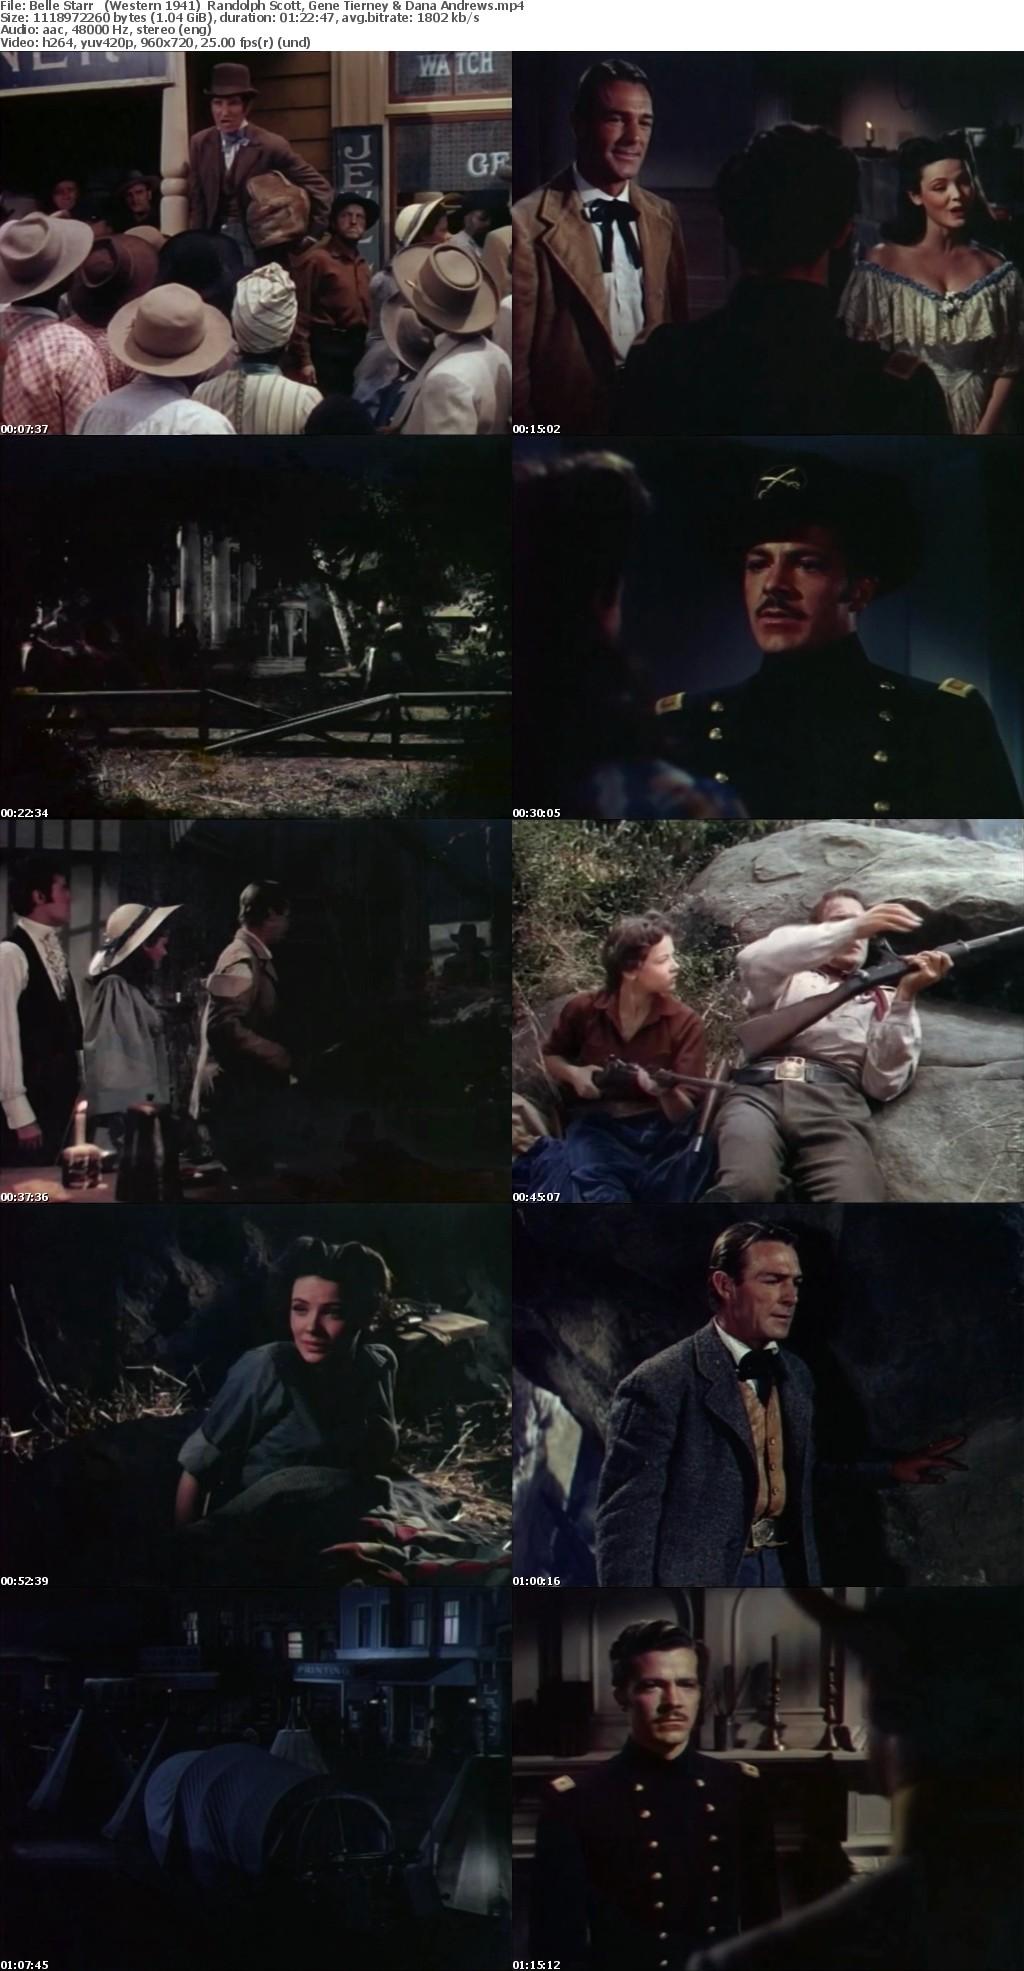 Belle Starr (Western 1941) Randolph Scott 720p